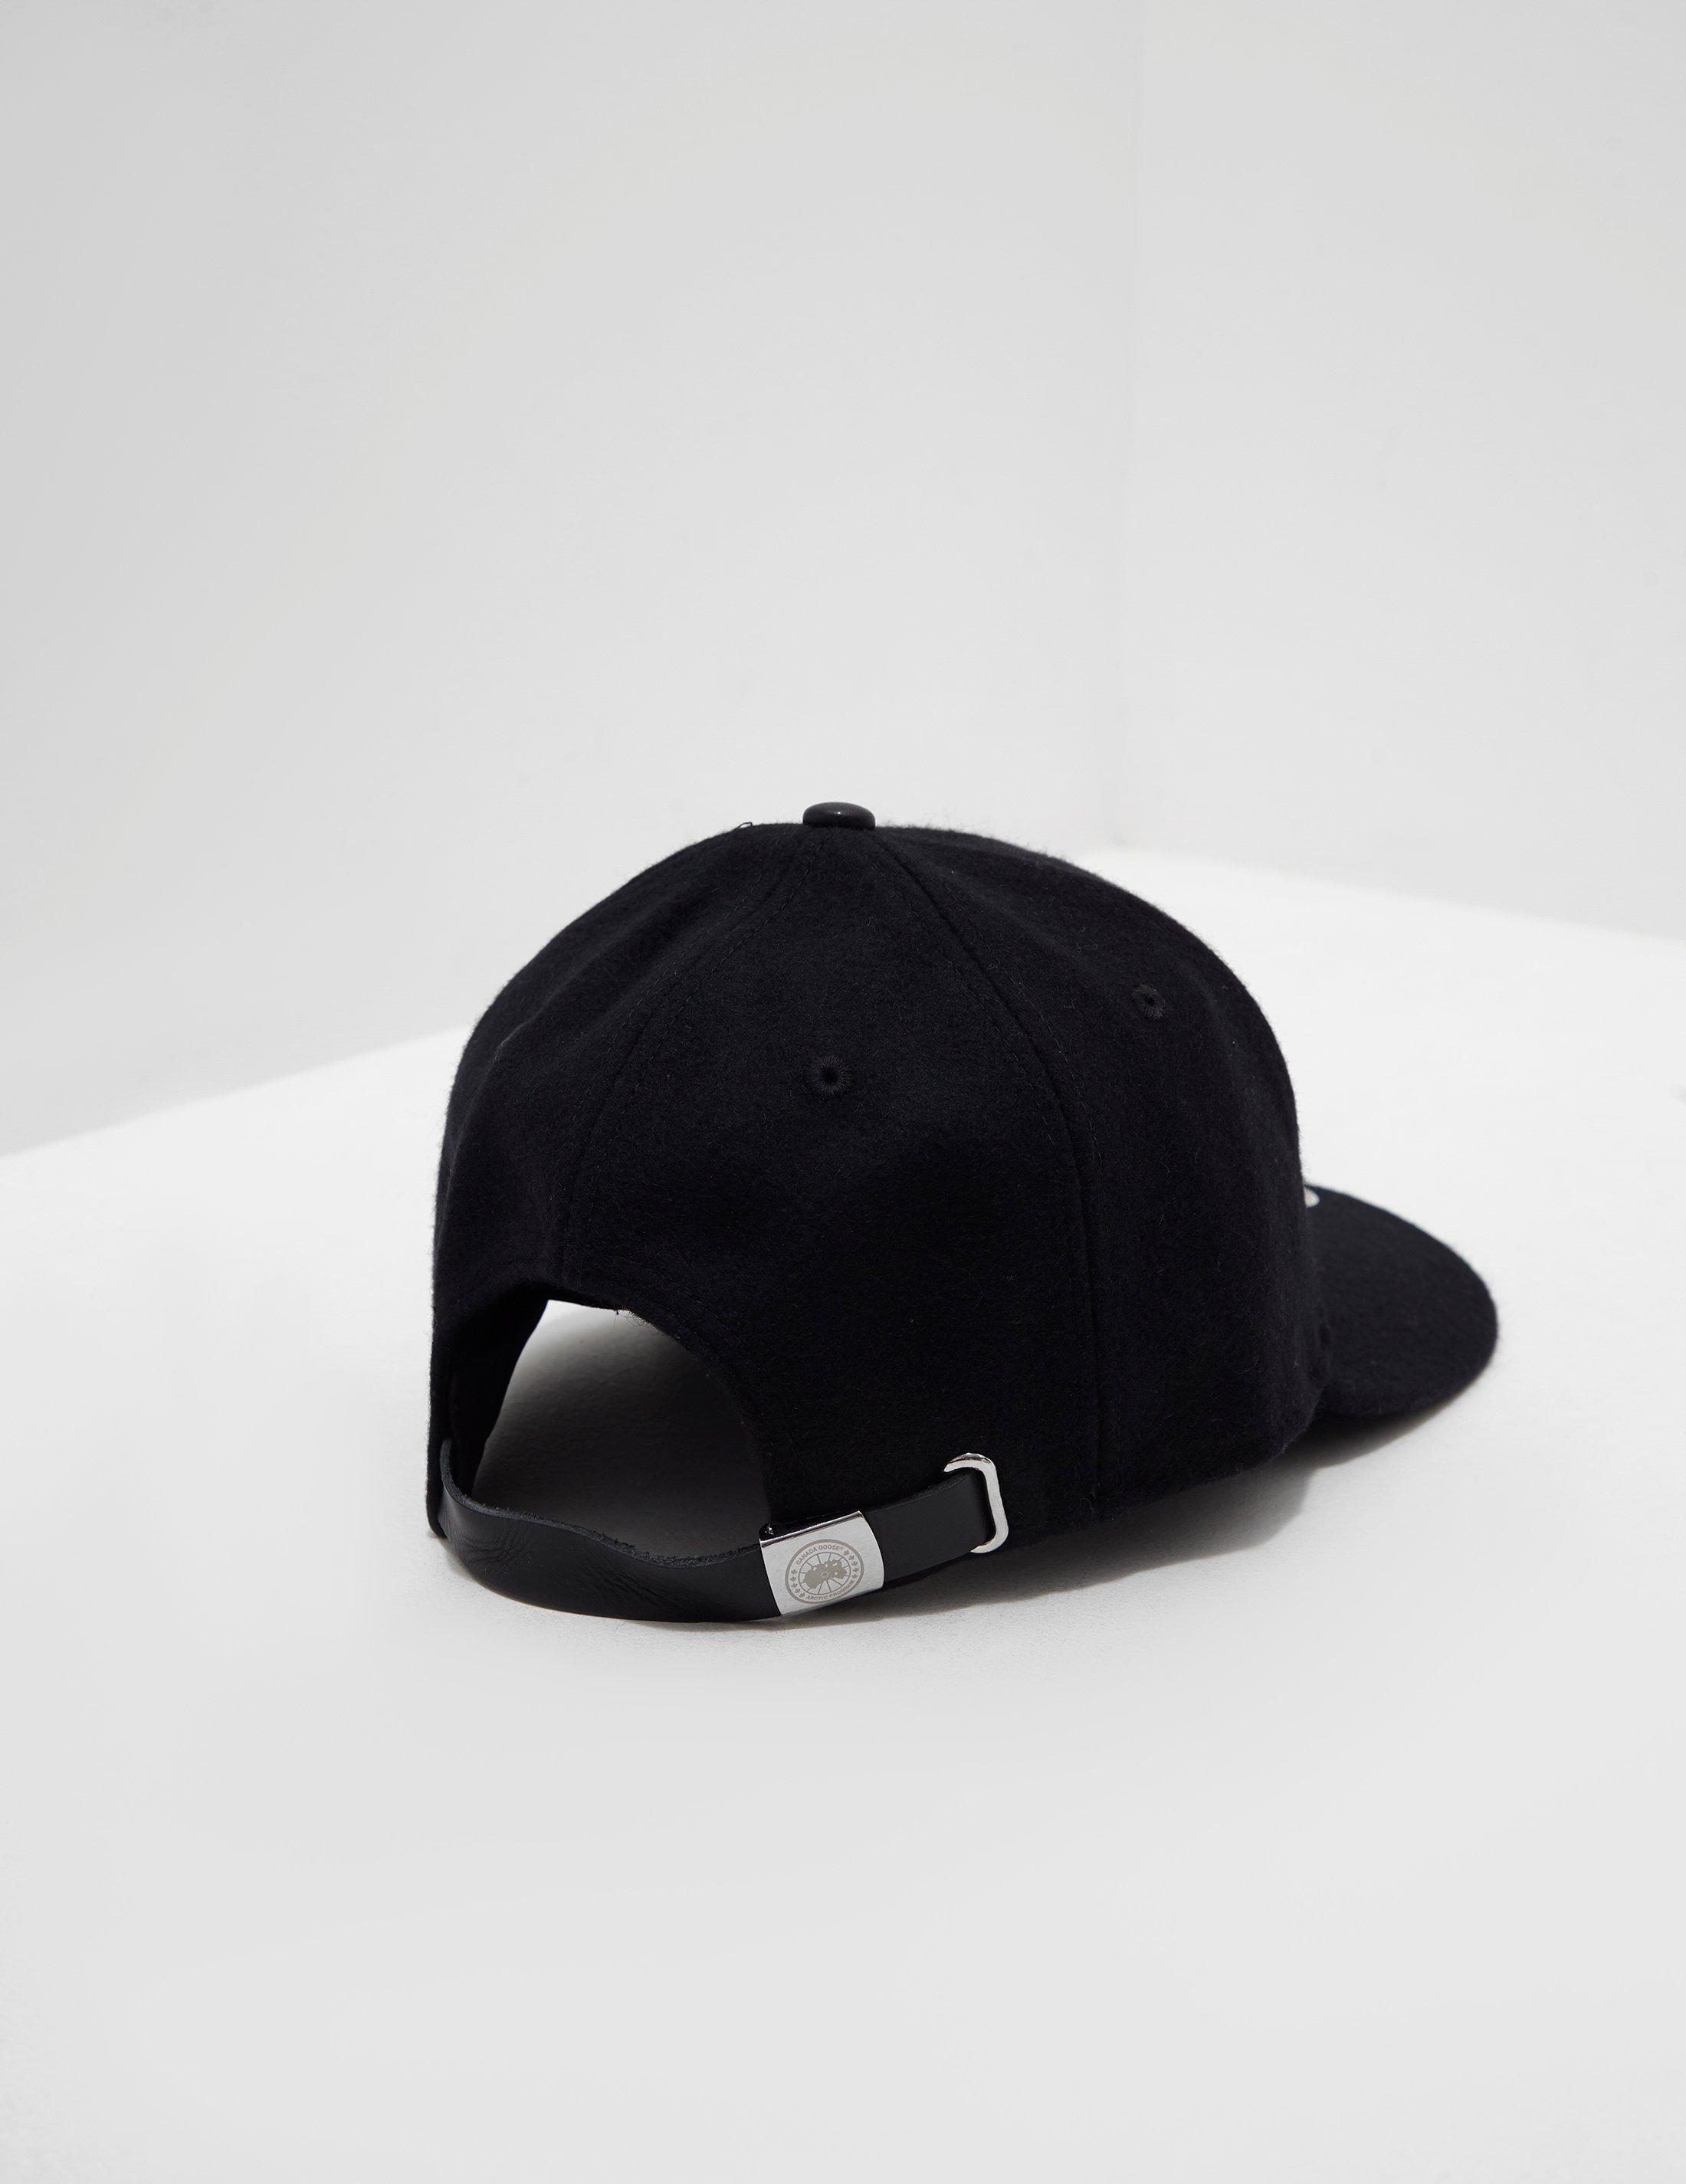 84993e9dab4 Canada Goose Wool Cap Black in Black for Men - Lyst